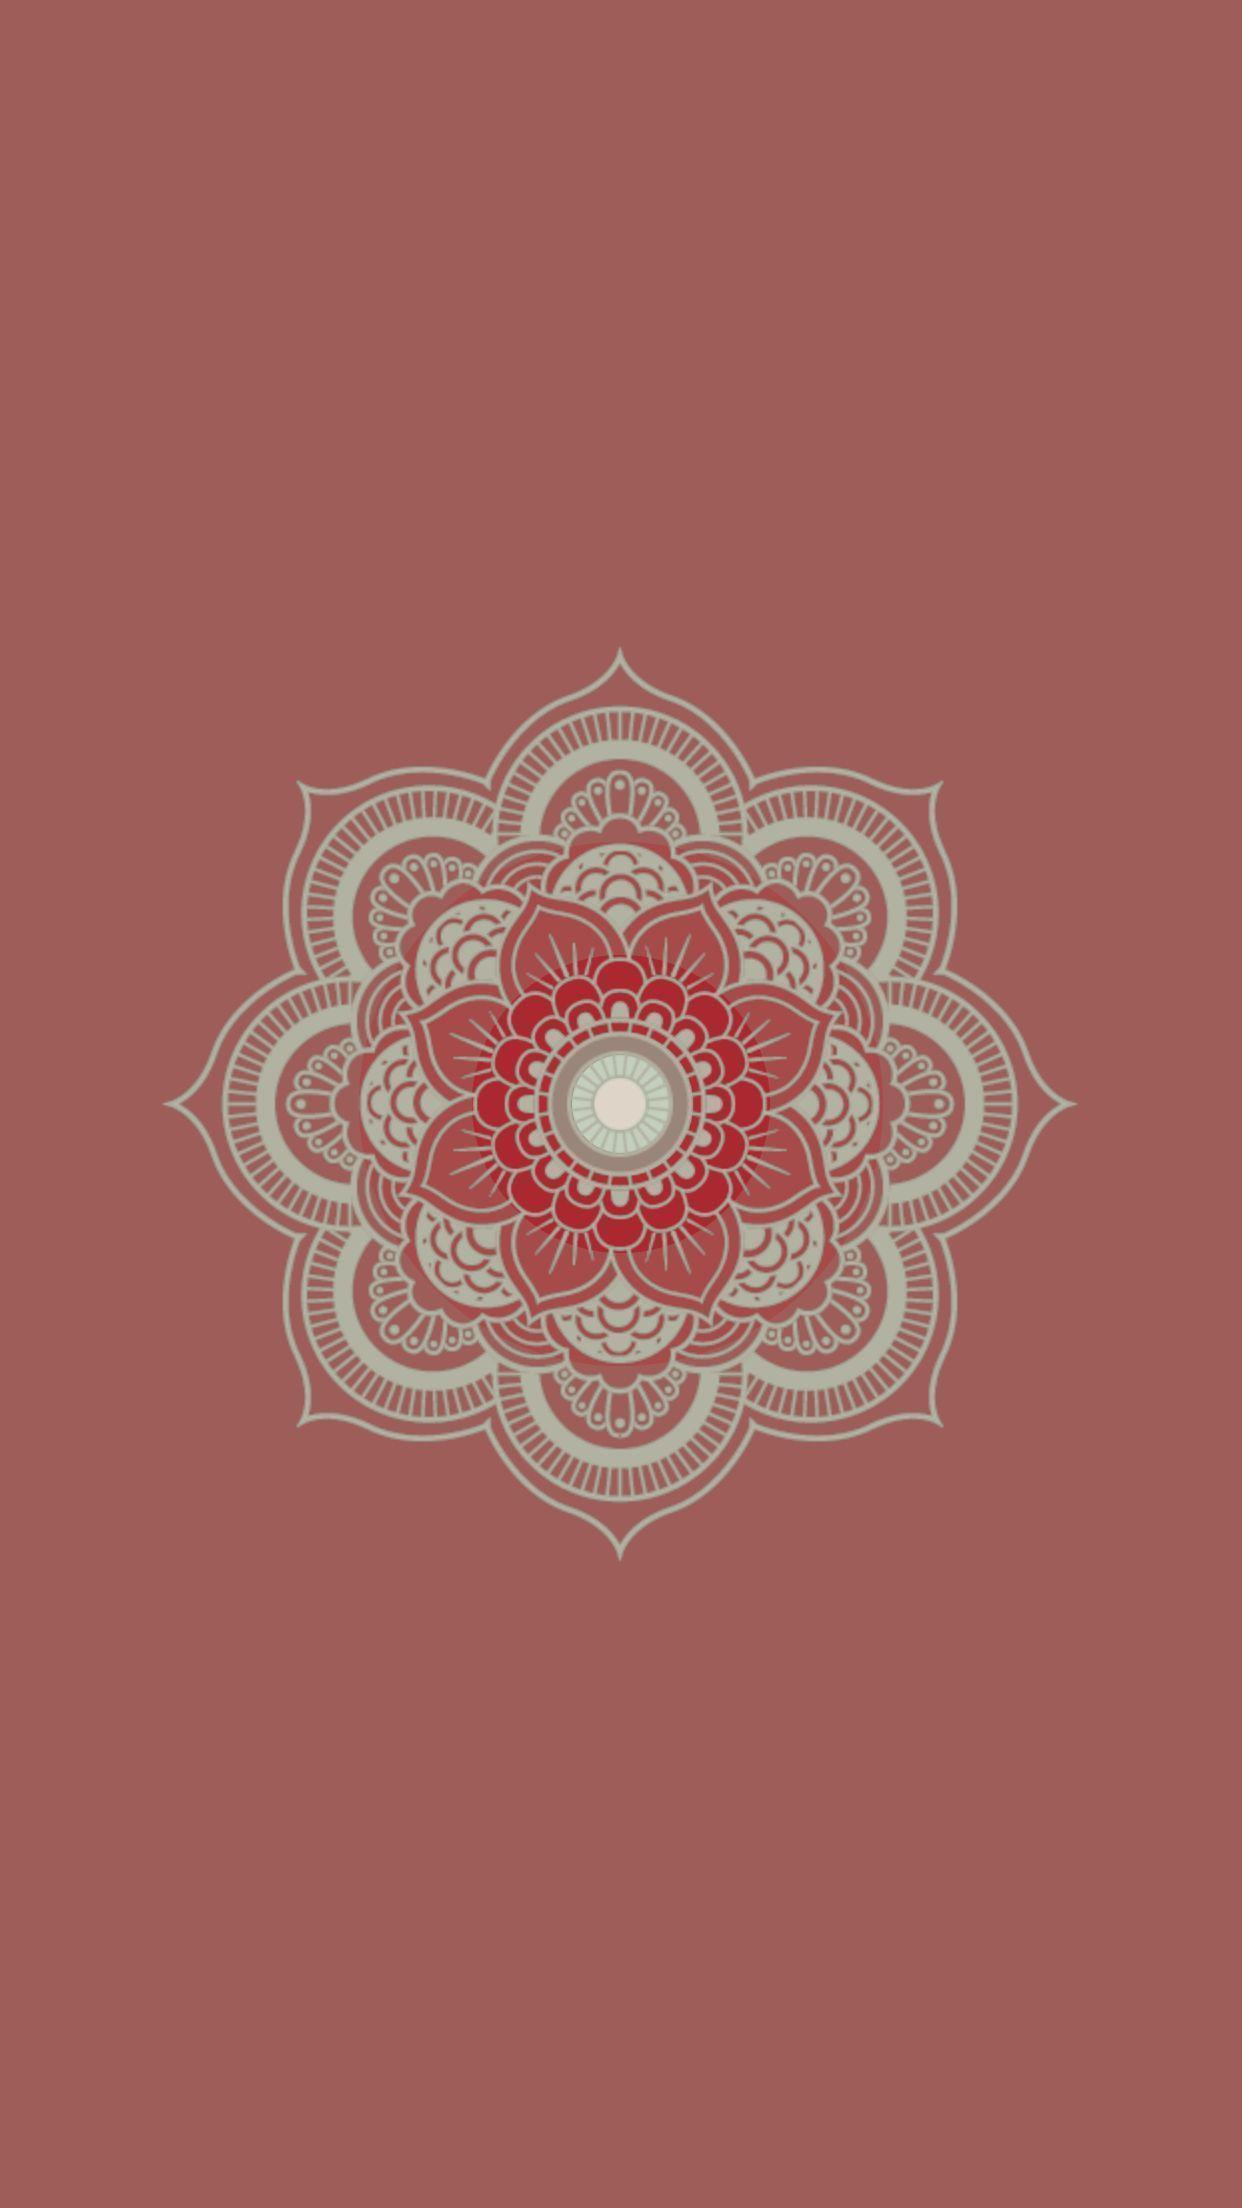 I made some iPhone Mandala High Resolution Wallpapers - Album on Imgur